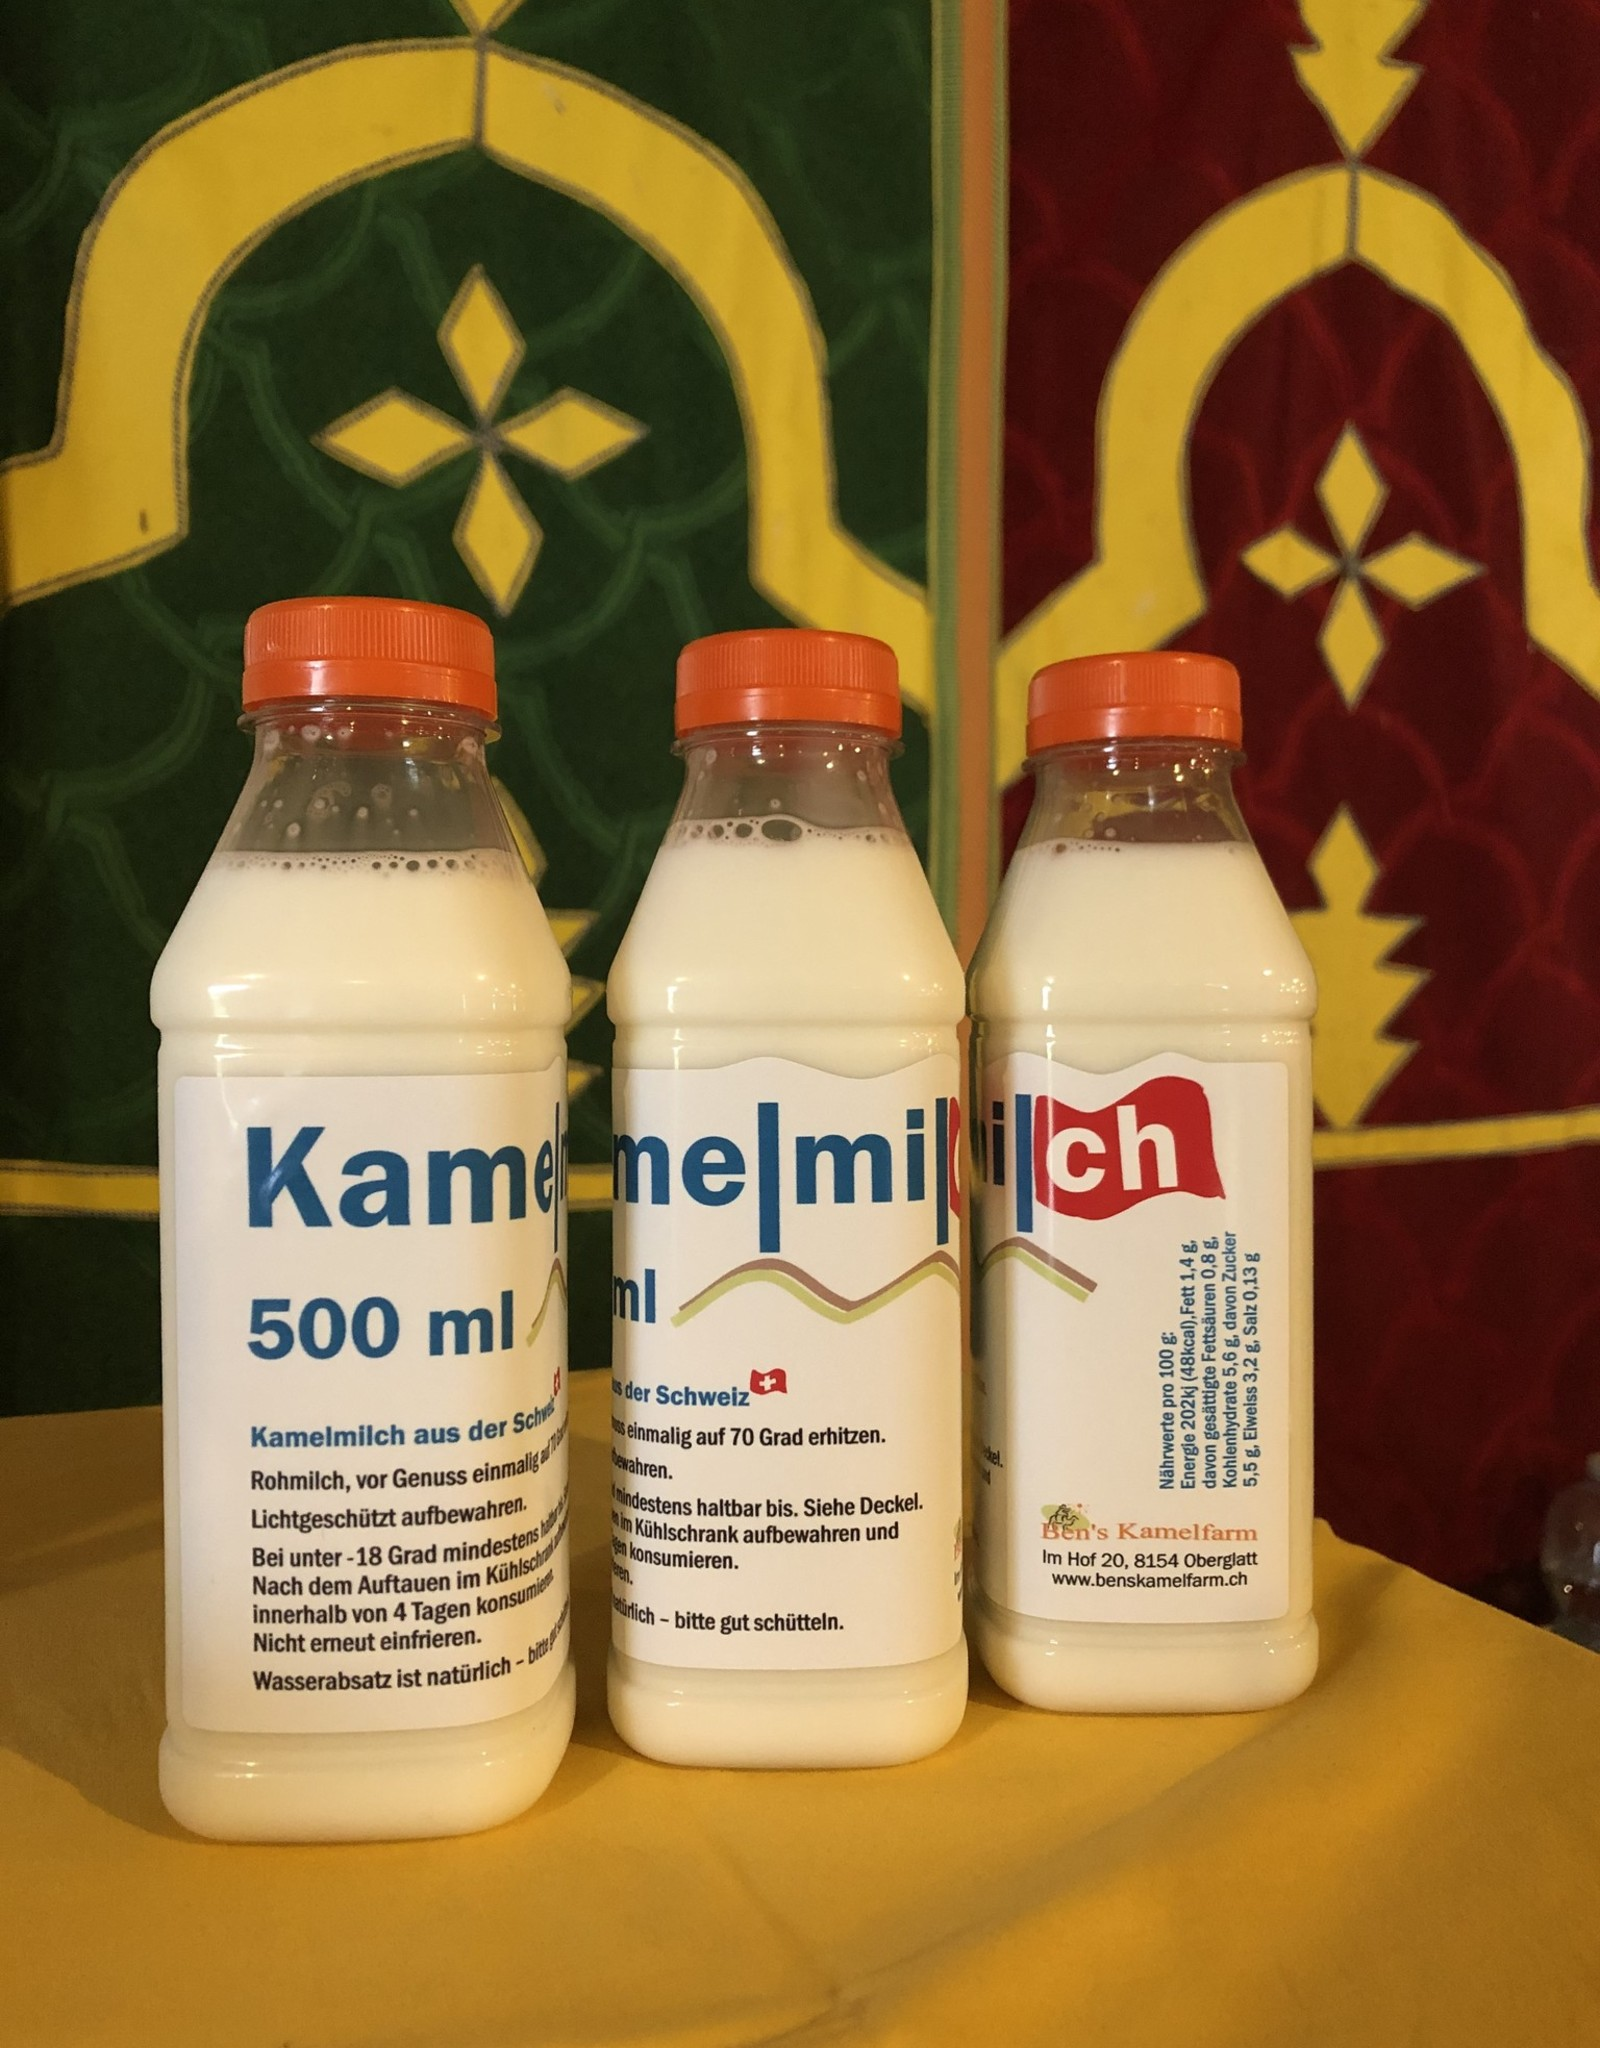 5 Liter Kamelmilch, roh, unbehandelt, tiefgefroren